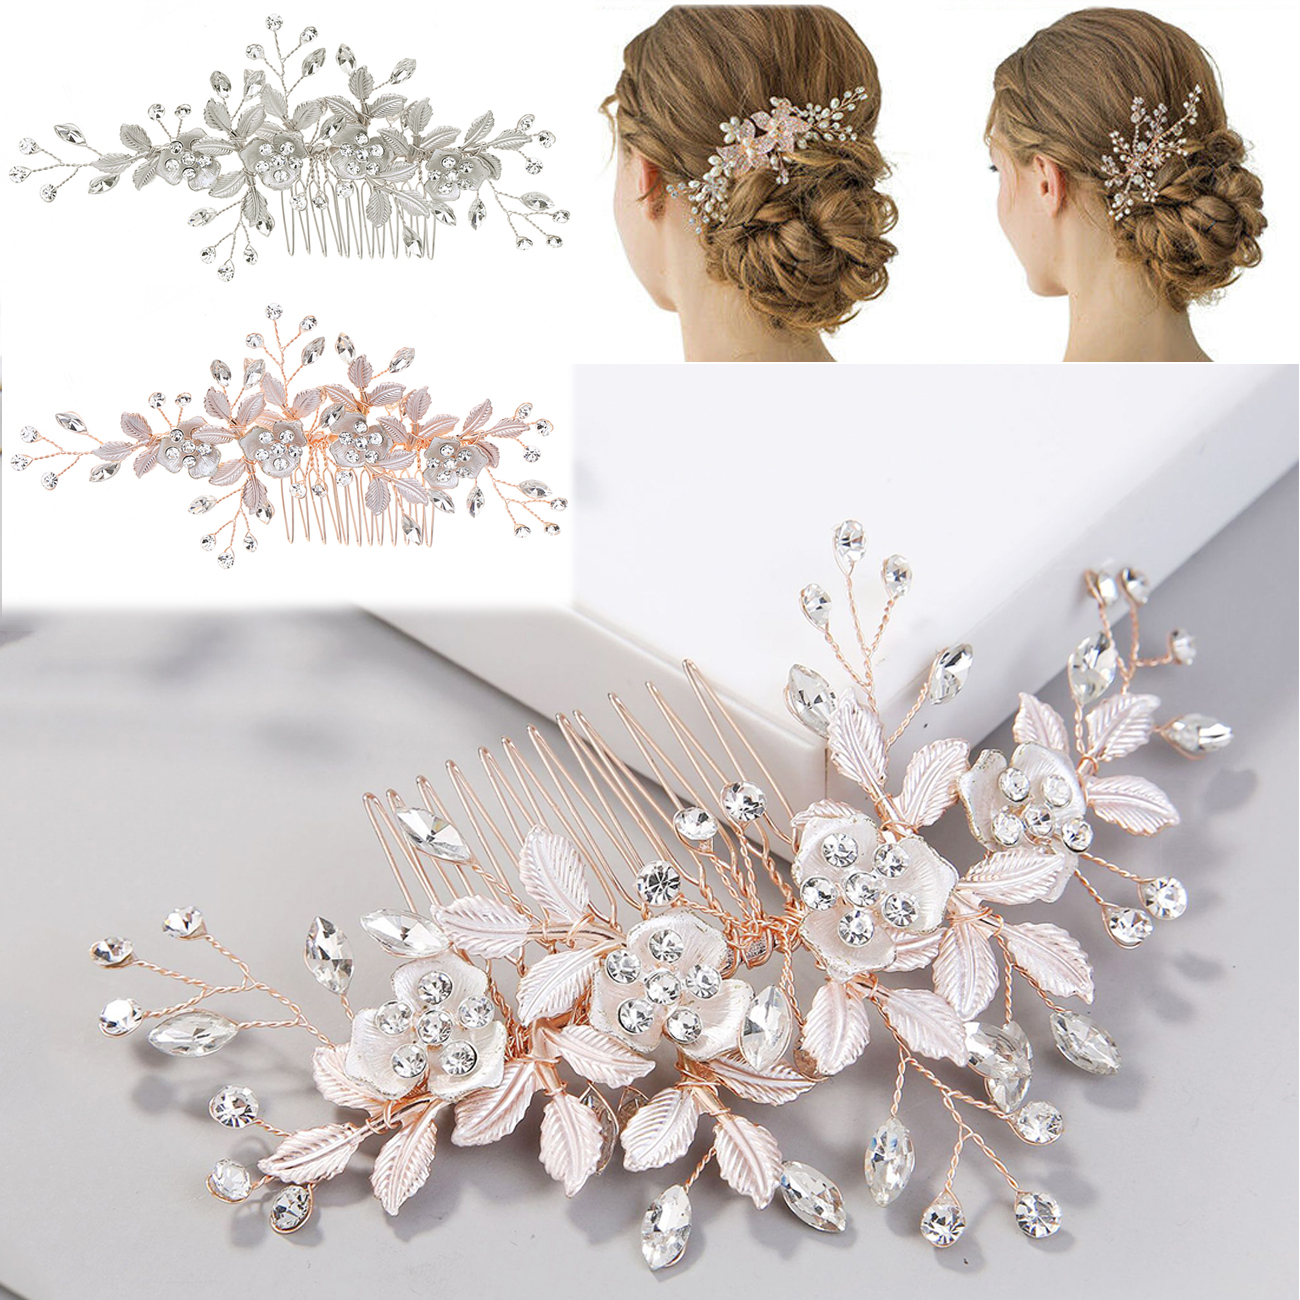 Leaves Flower Crystal Hair Comb Wedding Hair Accessories Bride Hair Clip Jewelry Ebay